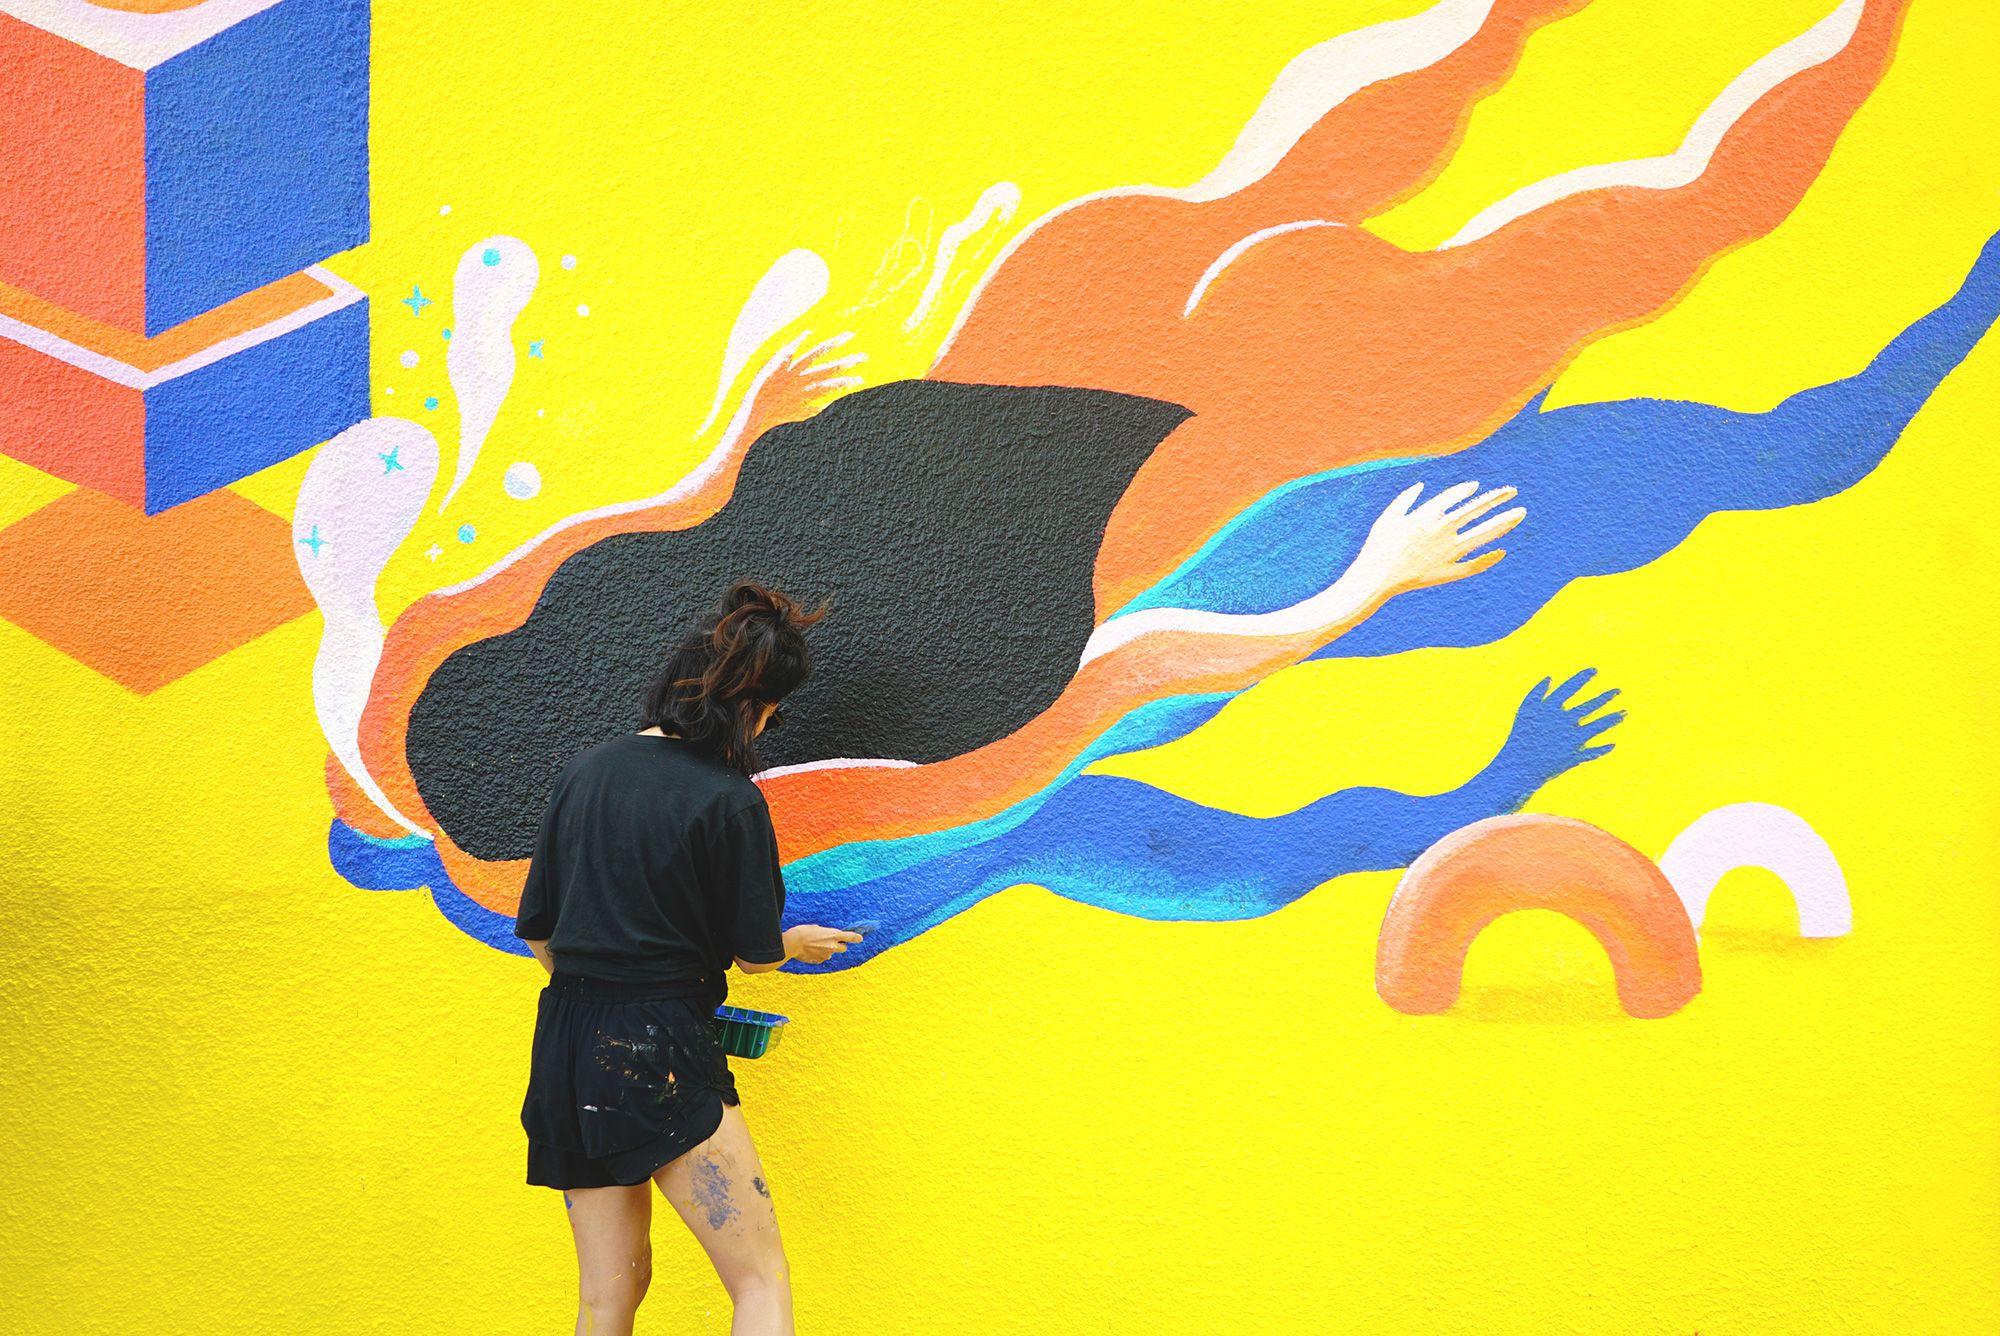 A Public Art Event Residential Murals Public Art Art Public